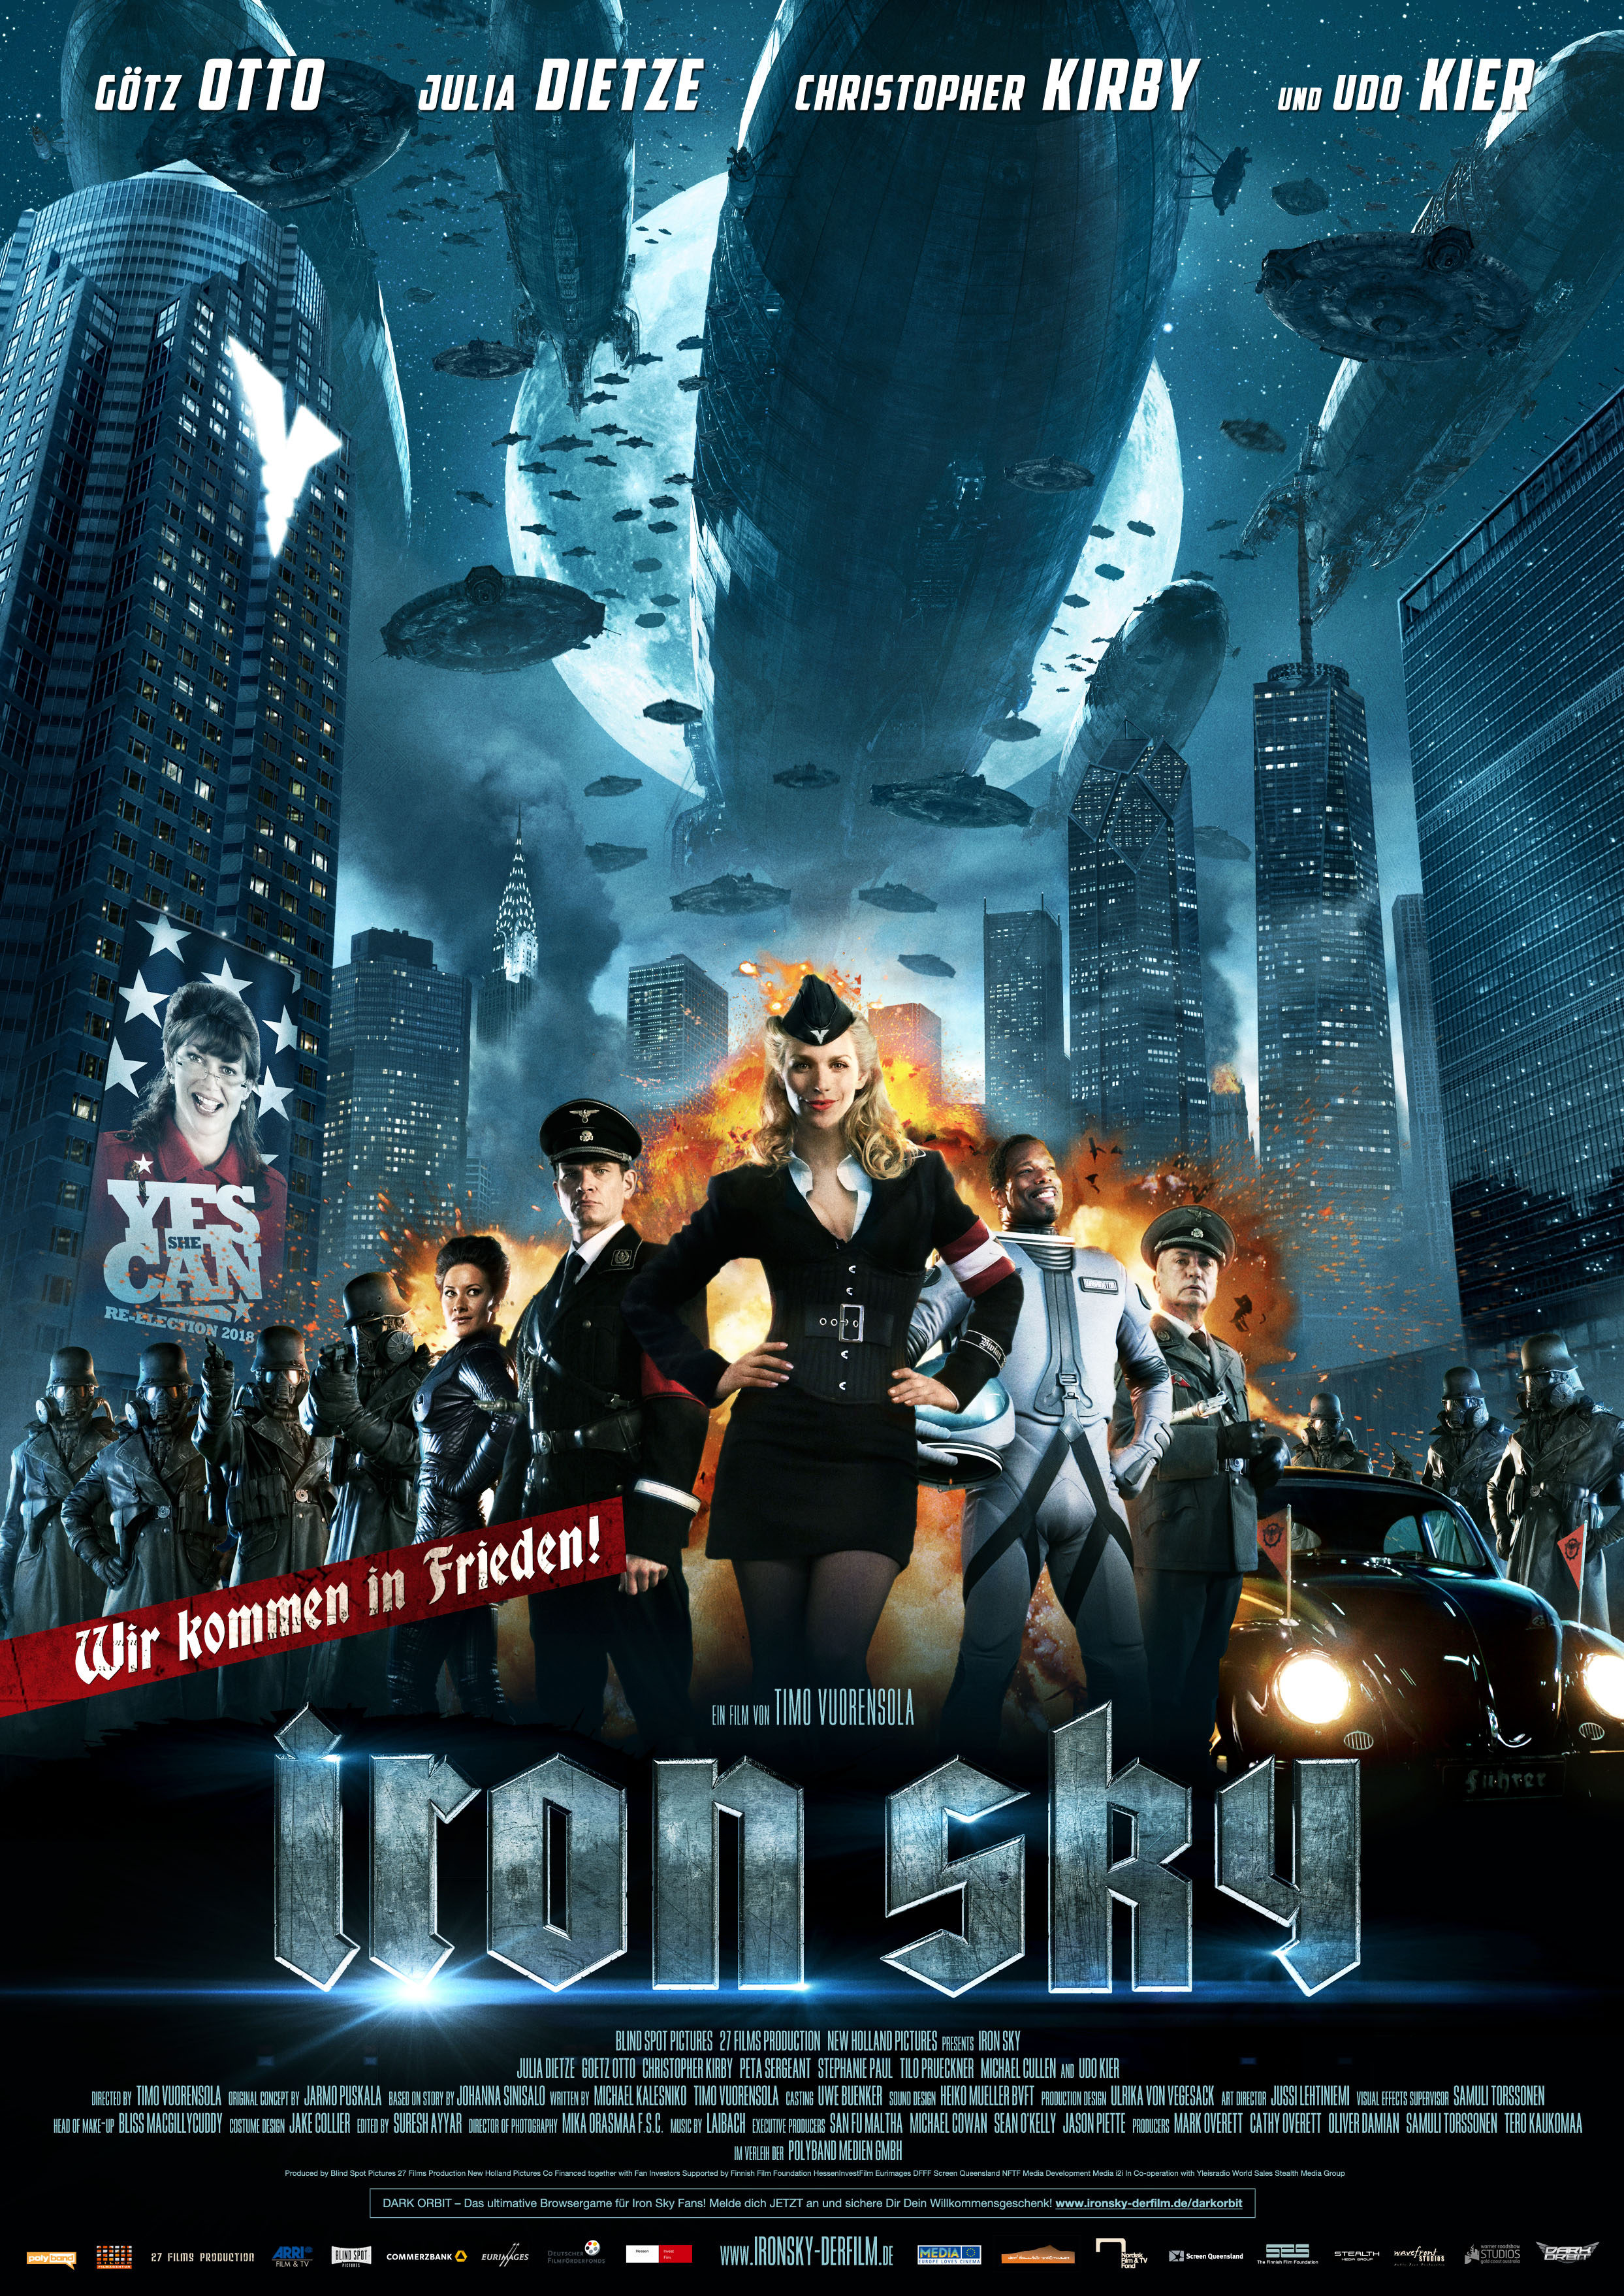 Sky Filme Suchen